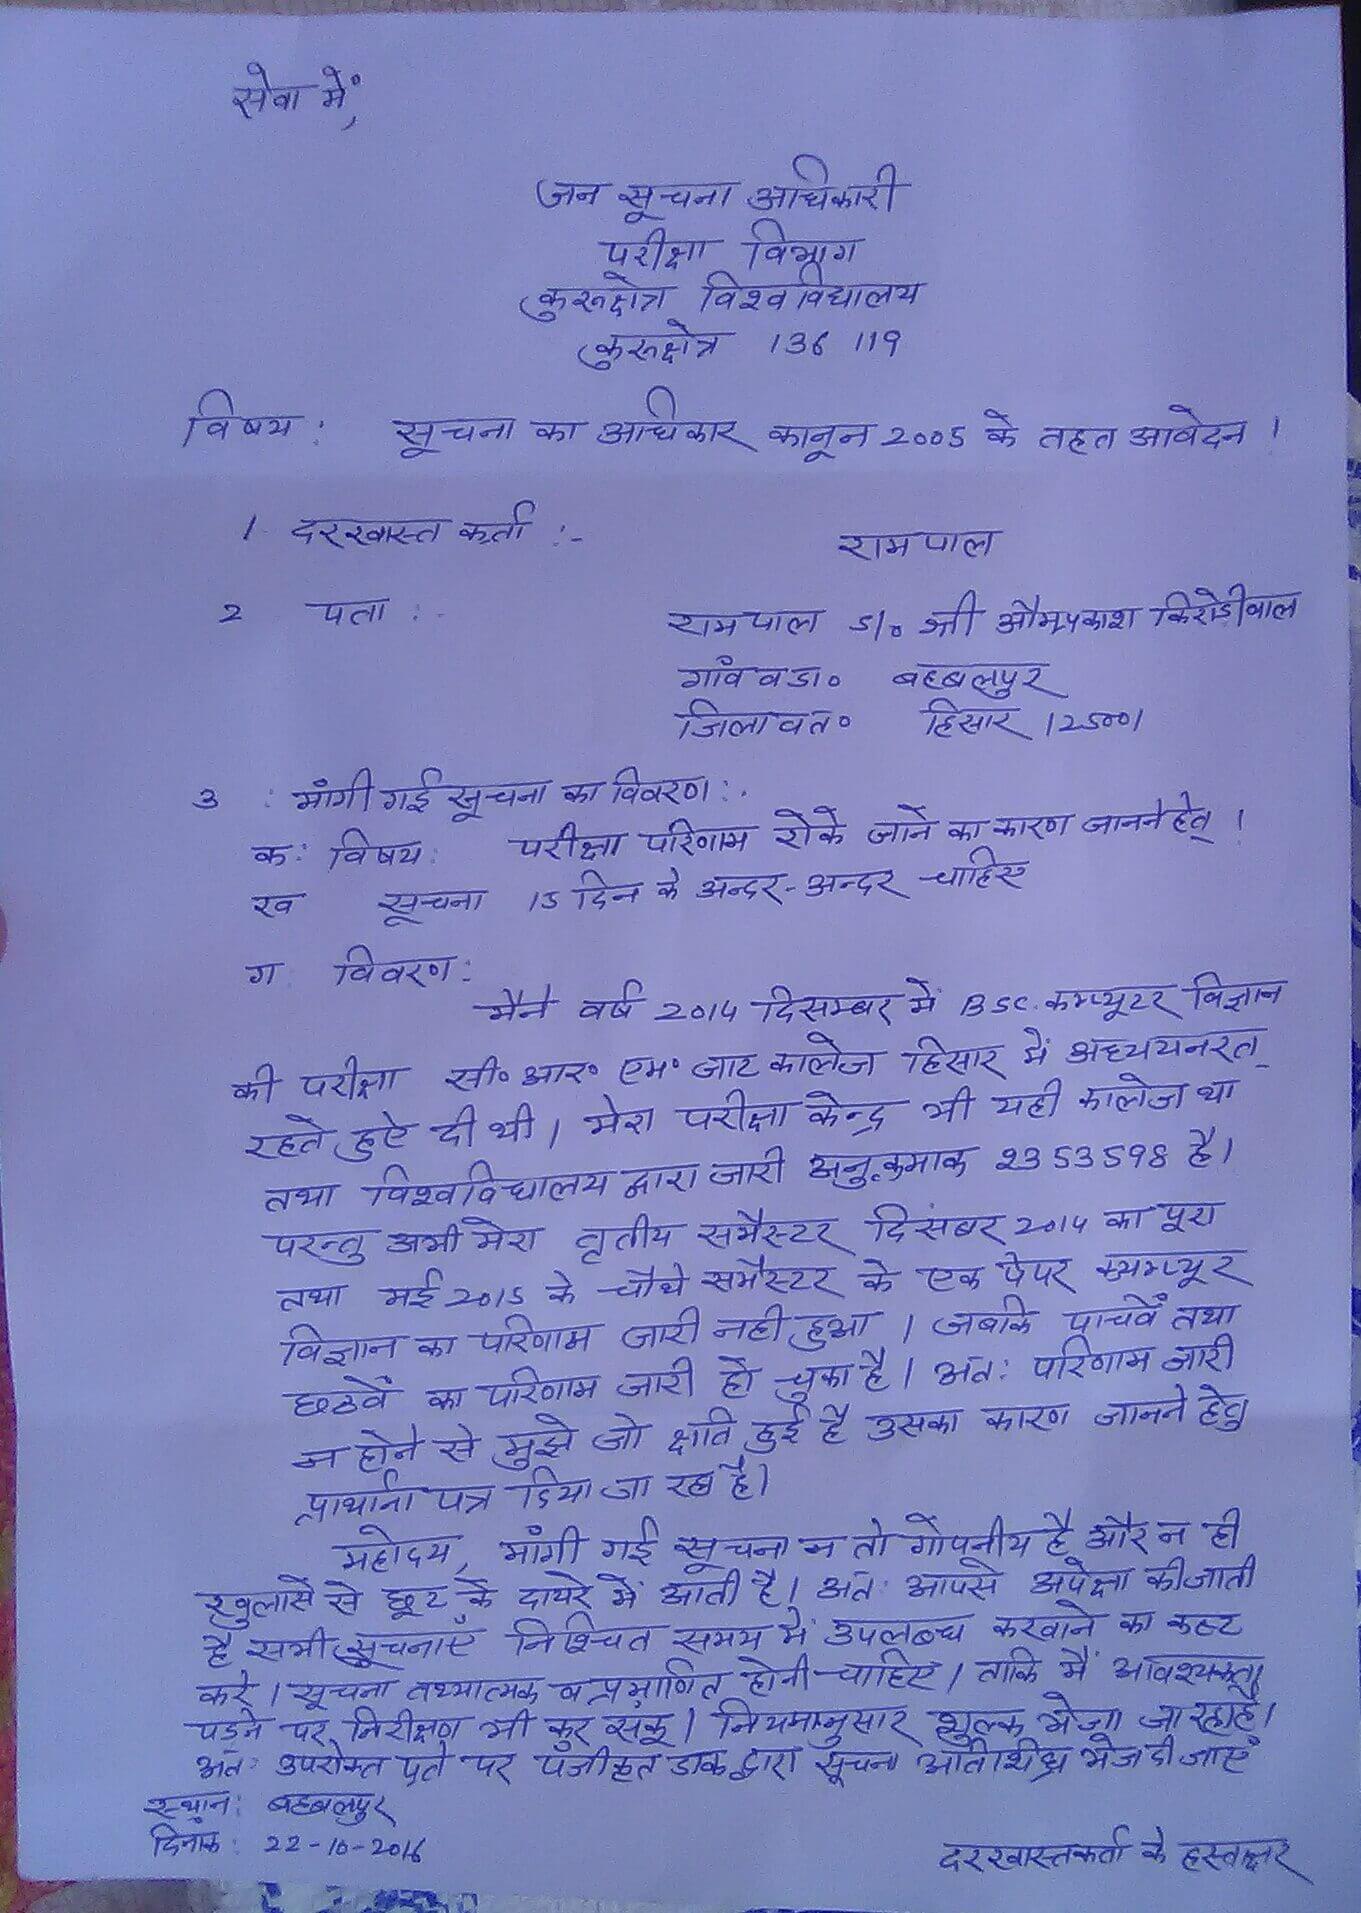 rti application format in hindi me real